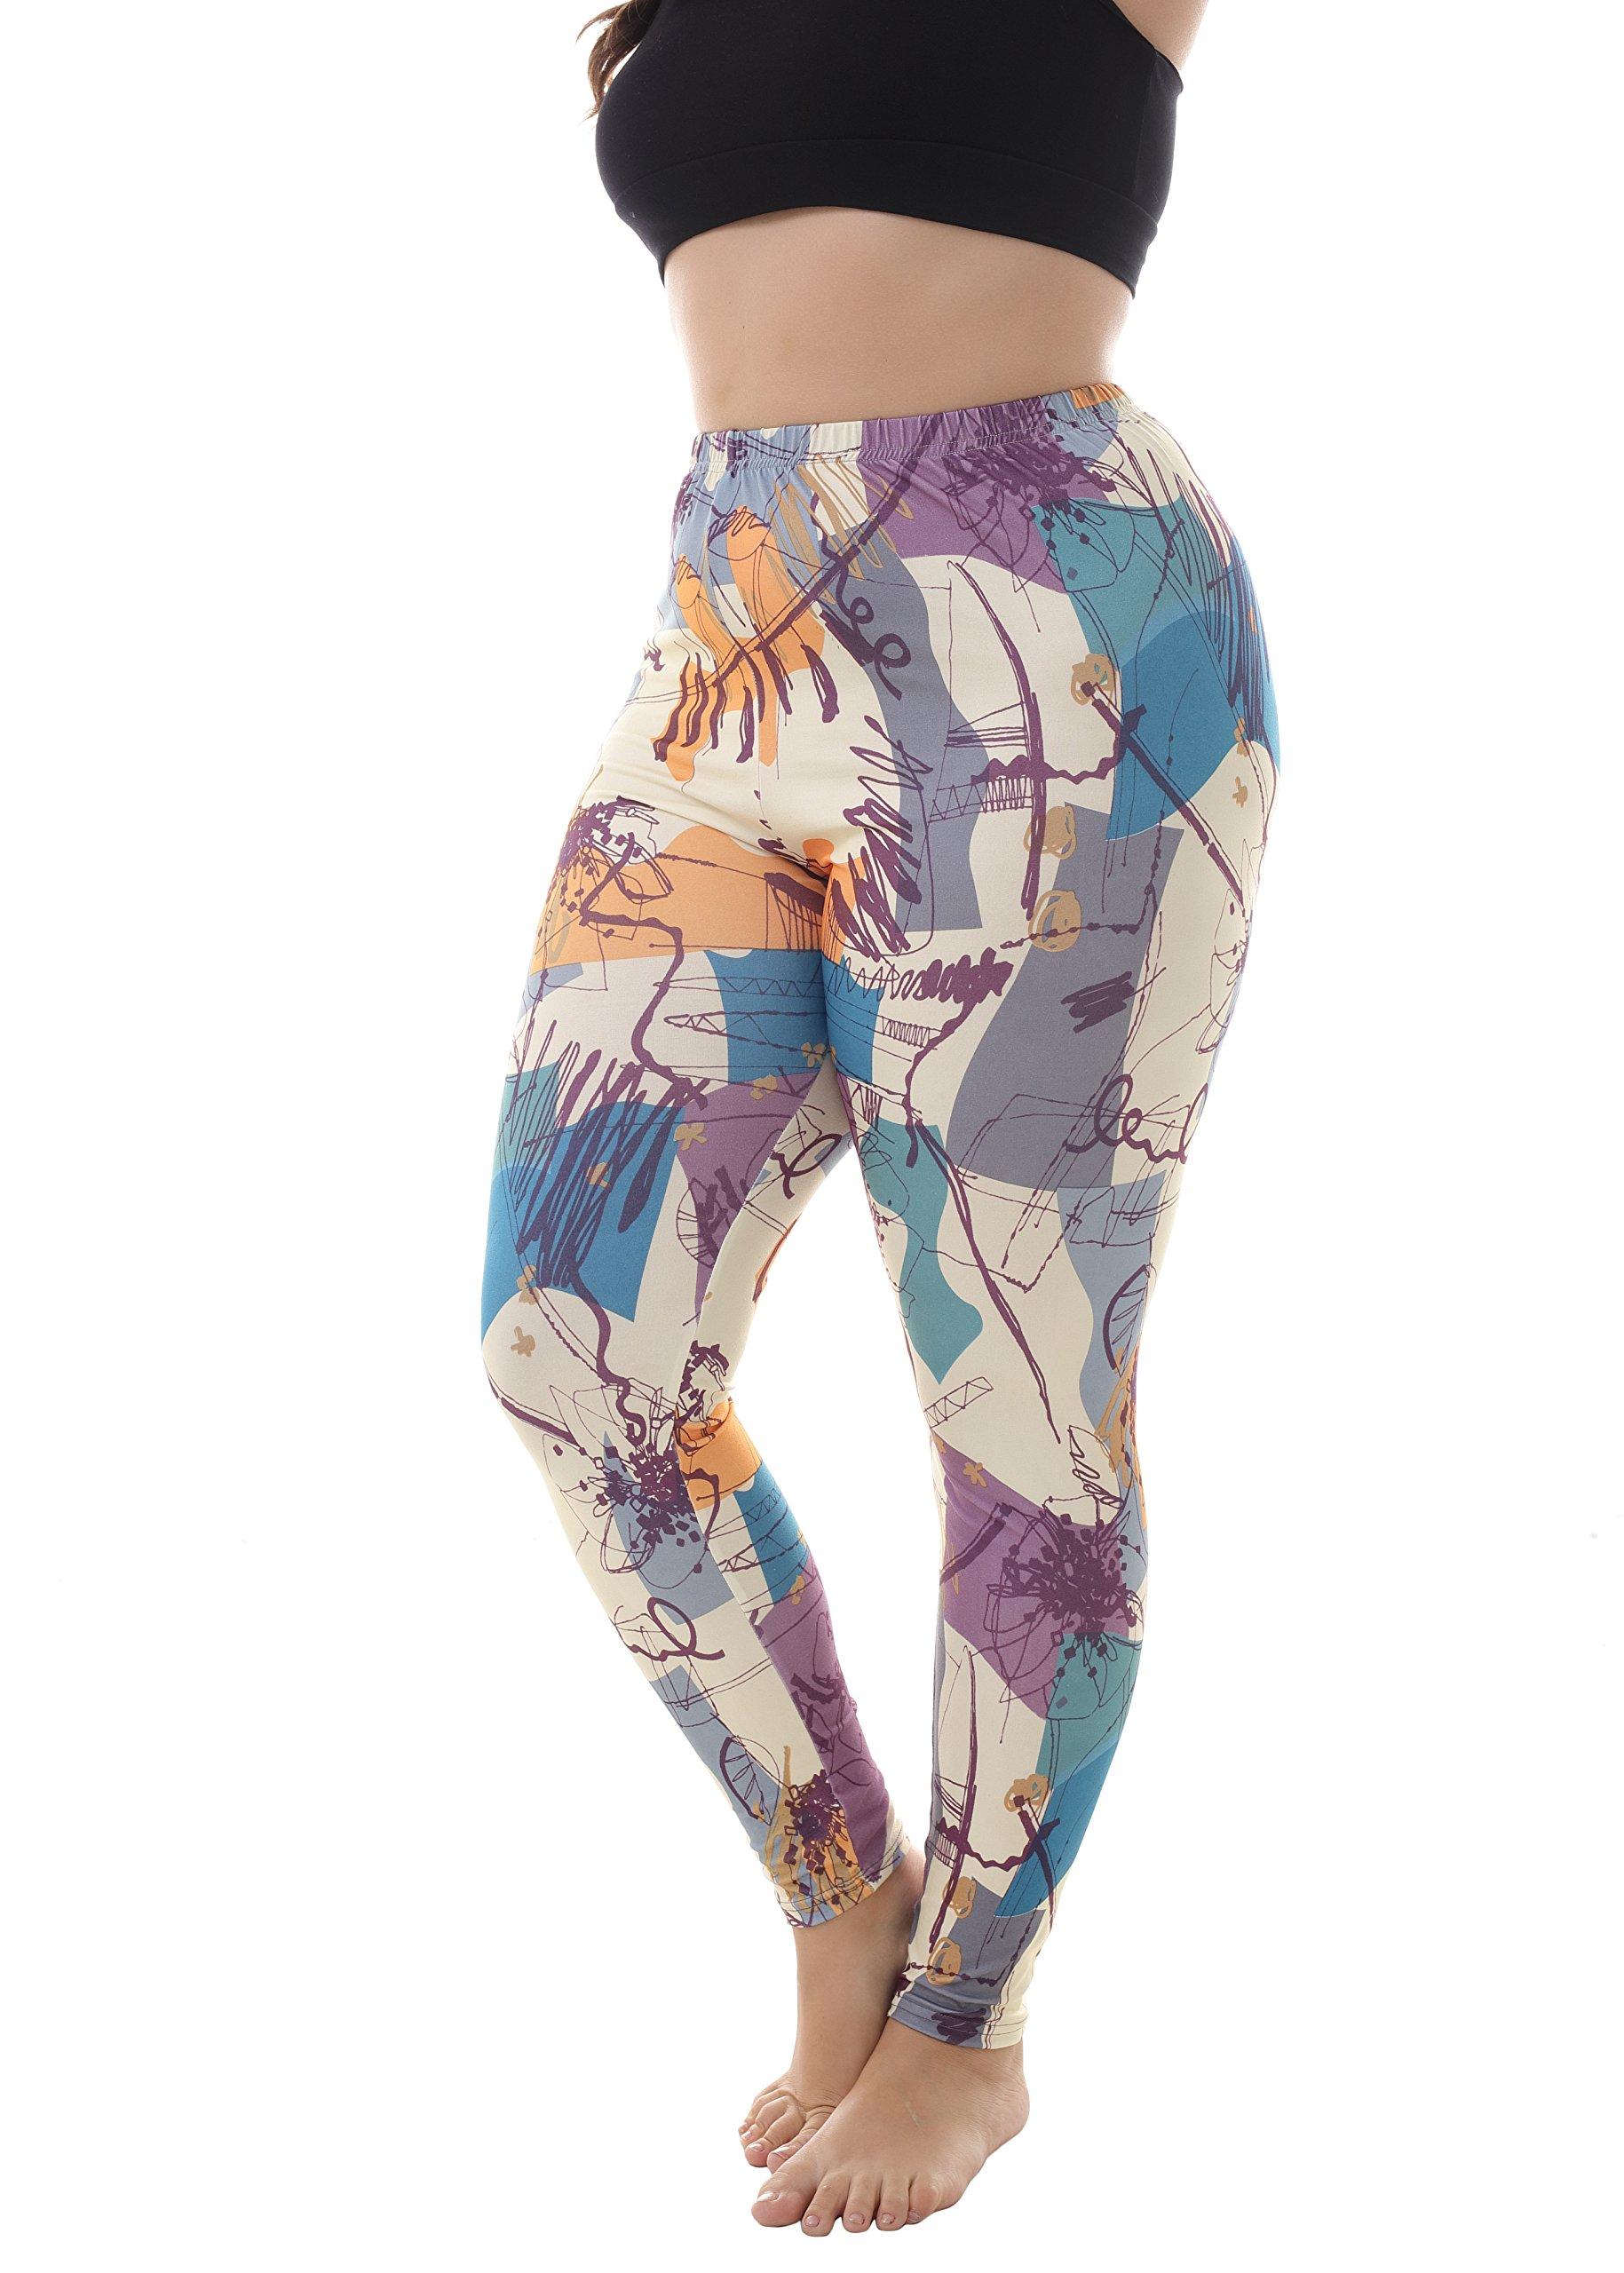 ZERDOCEAN Women's Plus Size Lightweight Printed Leggings for Summer style-803 2X